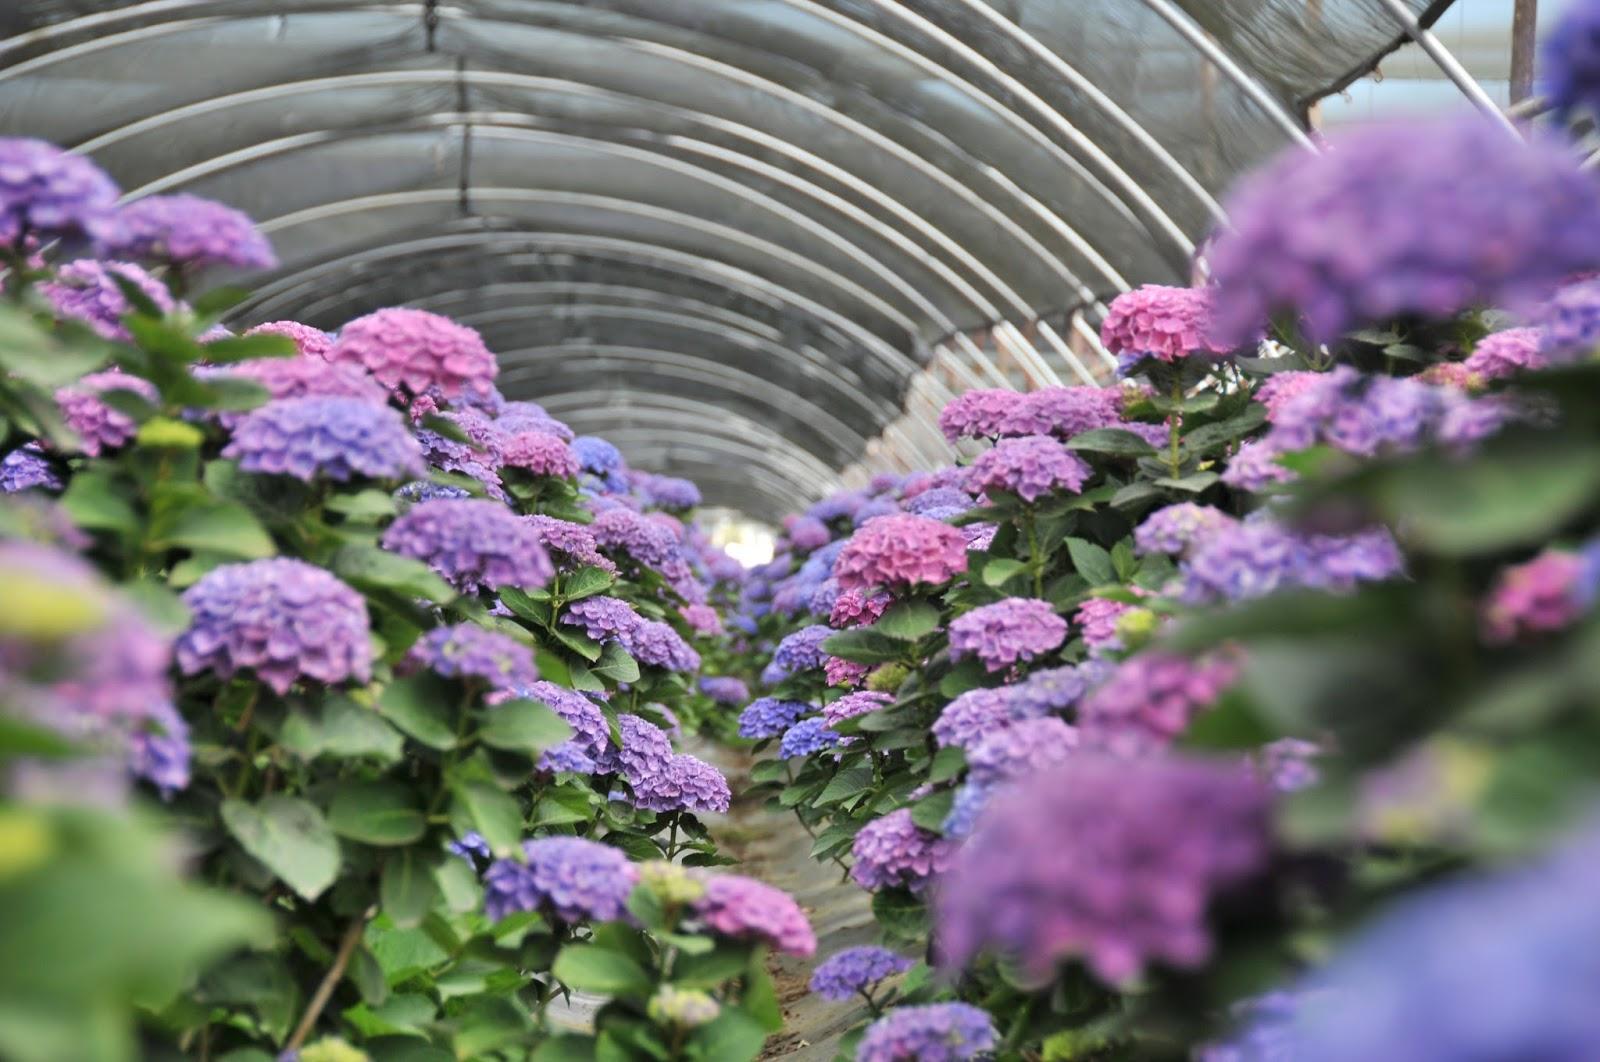 The new everlasting colors of hydrangea flower talk growing purple hydrangea izmirmasajfo